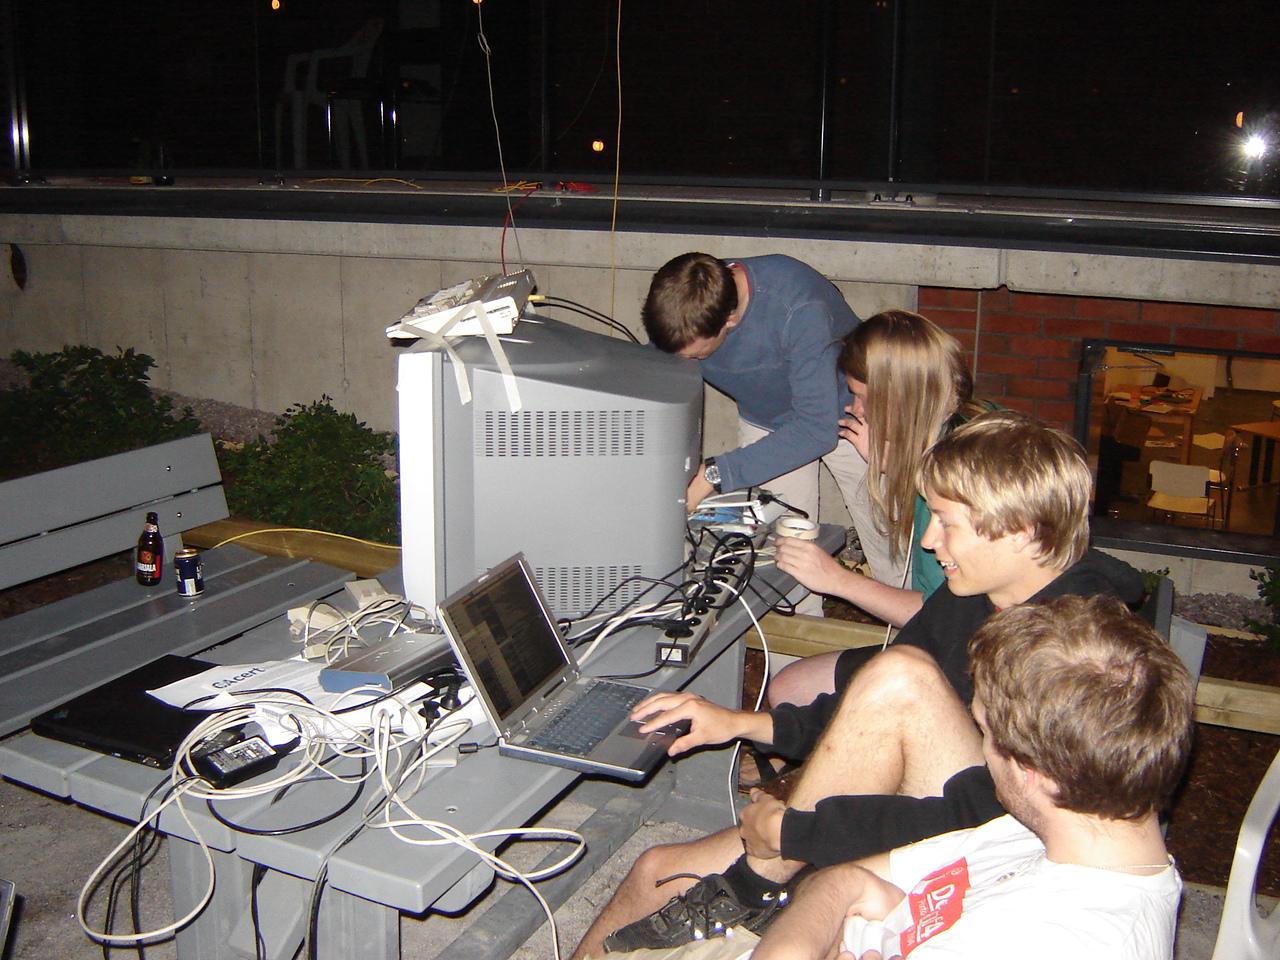 Setting up the Tournament Lemmings Amiga outside